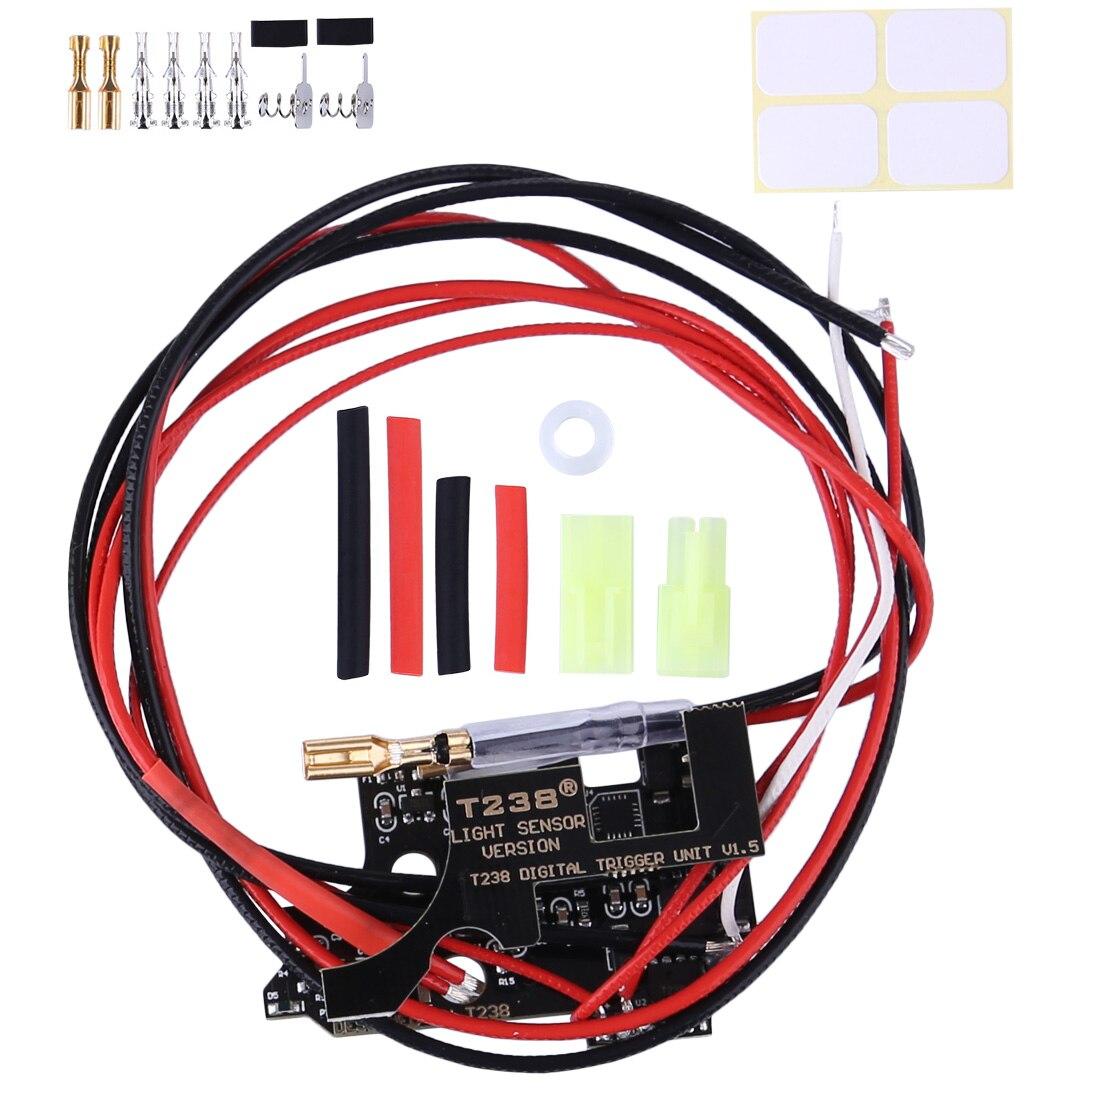 Version 1.7 T238 Programmable MOSFET Electronic Fire Control Module for XWE M4 /JM Gen.9 /FB /Kublai /Jingji /JQ No.2 Gearbox